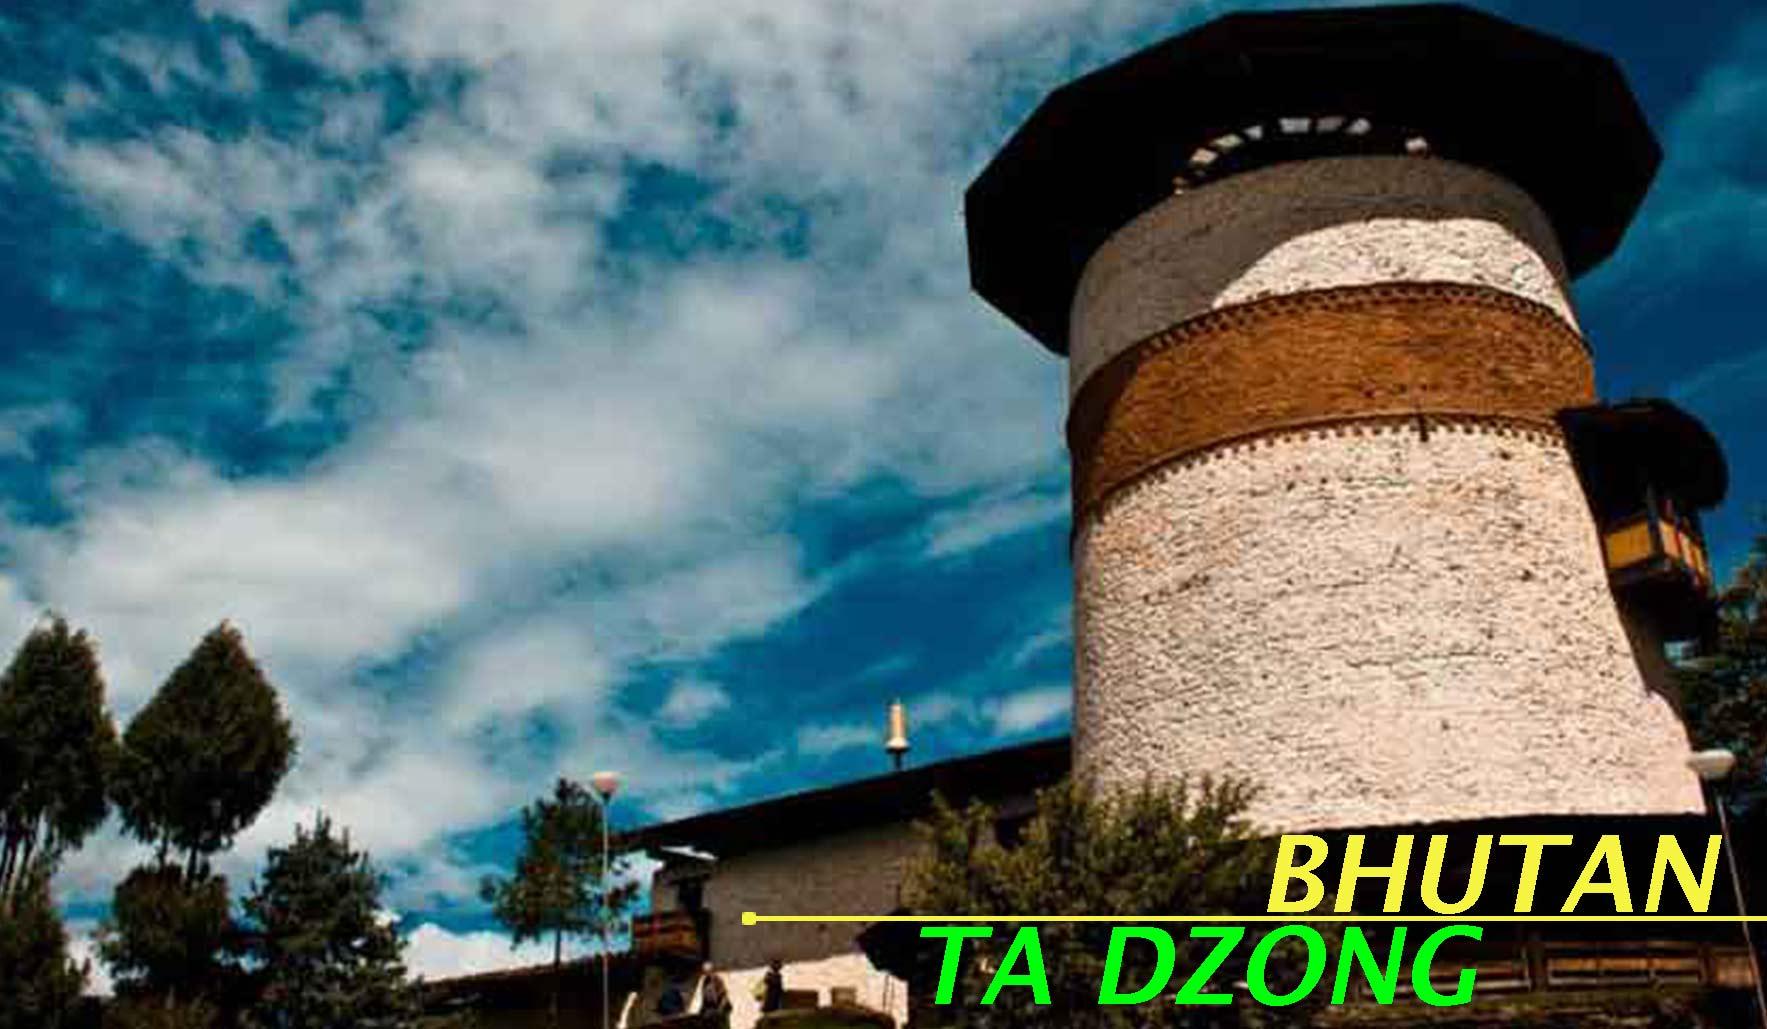 Visit Ta Dzong during Bhutan Package from Mumbai